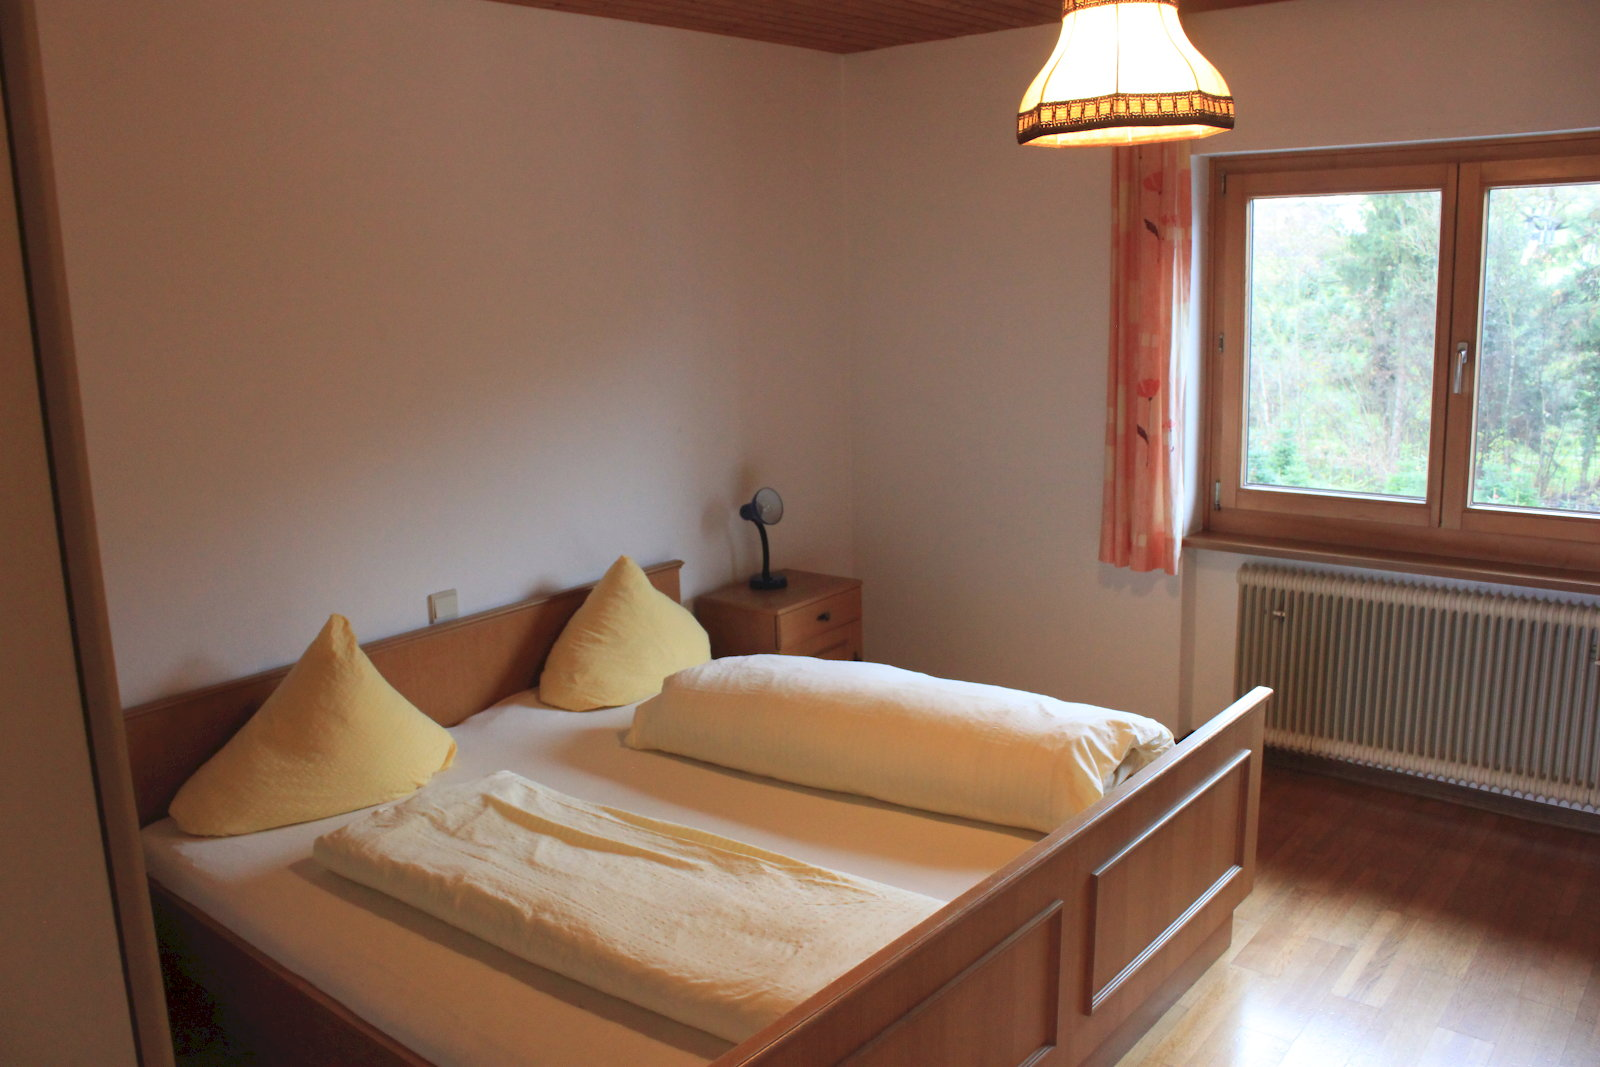 Appartement de vacances B&B - Restaurant TSINGDAO (Hörbranz). Doppelzimmer (2437460), Hörbranz, Bregenz, Vorarlberg, Autriche, image 9